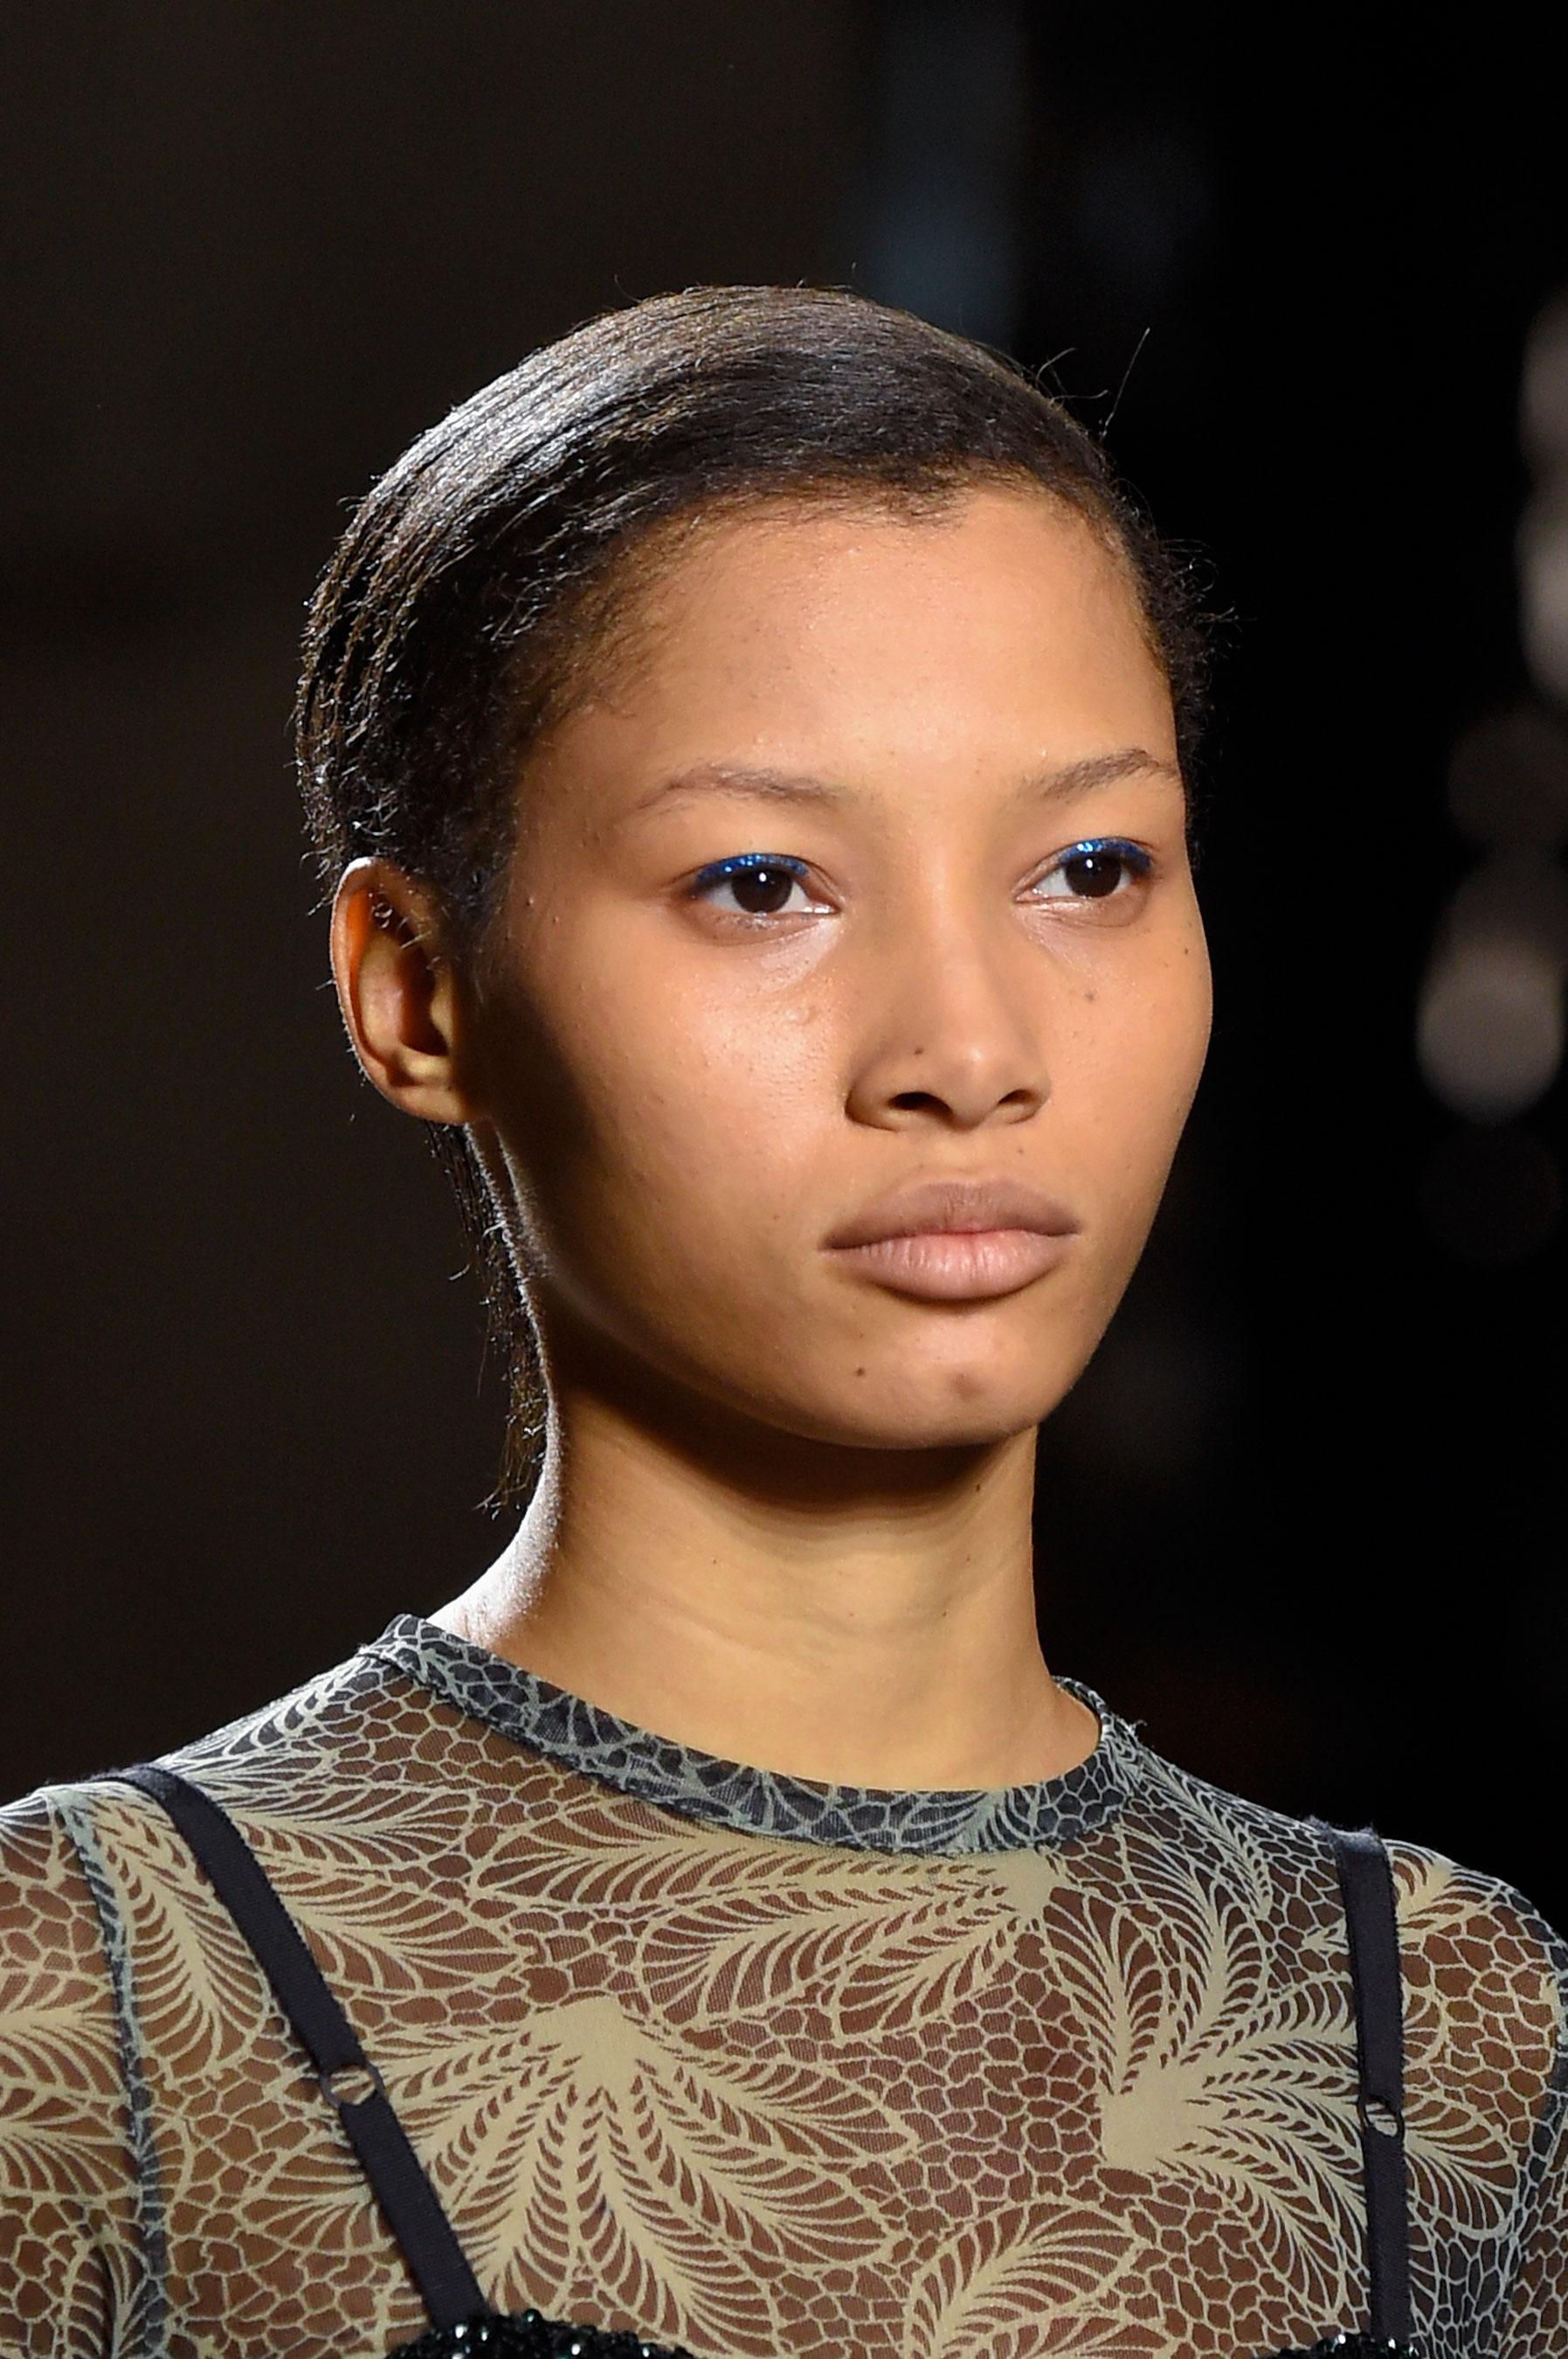 Dries-van-Noten-spring-2016-runway-beauty-fashion-show-the-impression-38